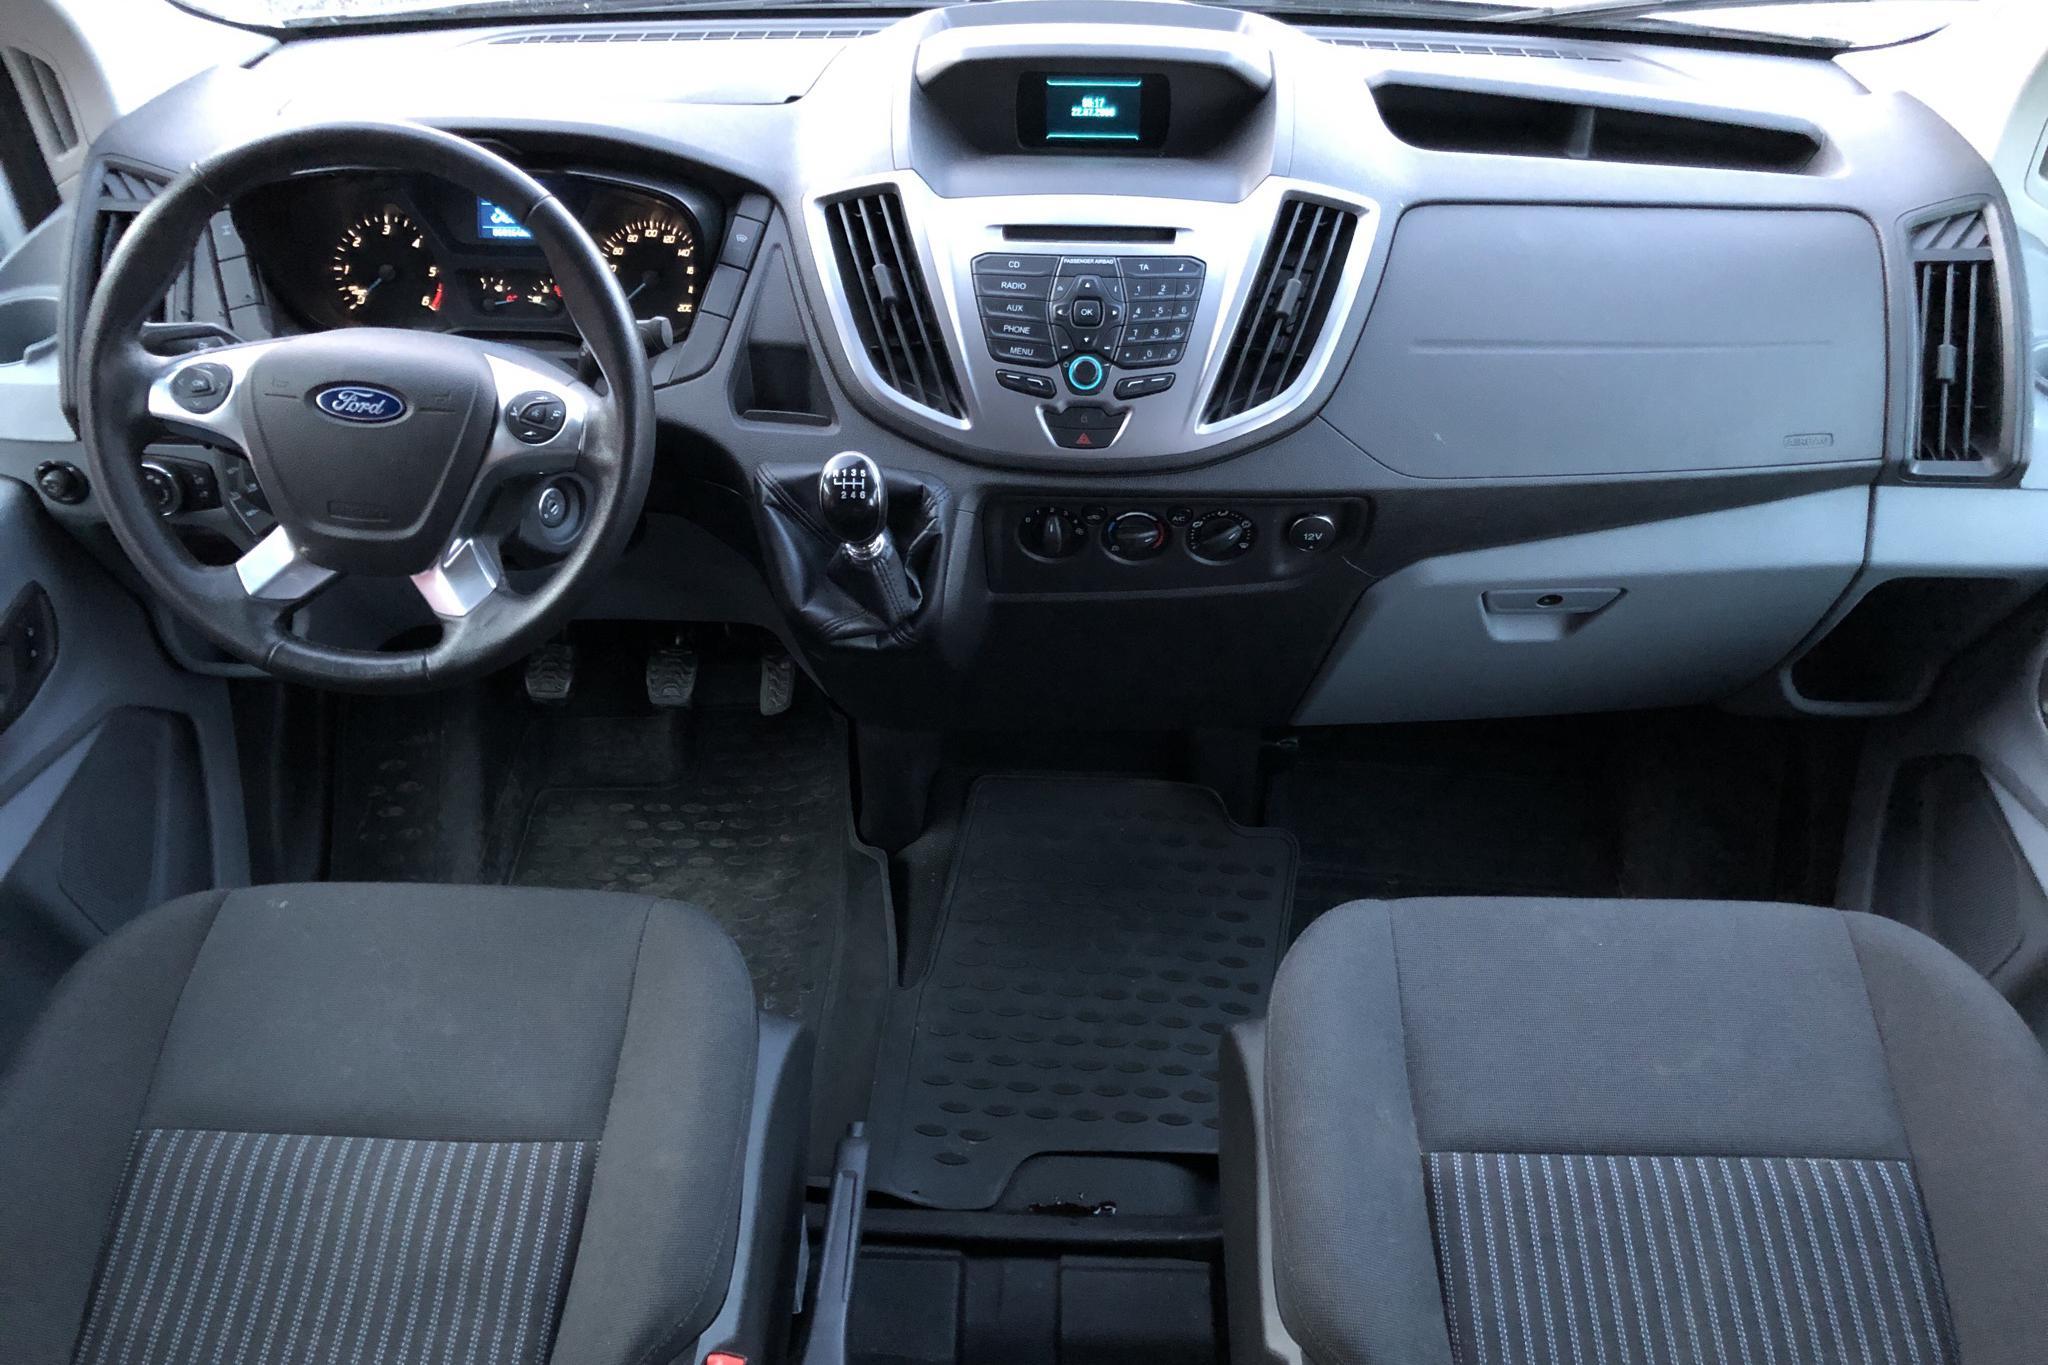 Ford Transit Chassi 350 2.2 TDCi AWD (125hk) - 68 150 km - Manual - white - 2015